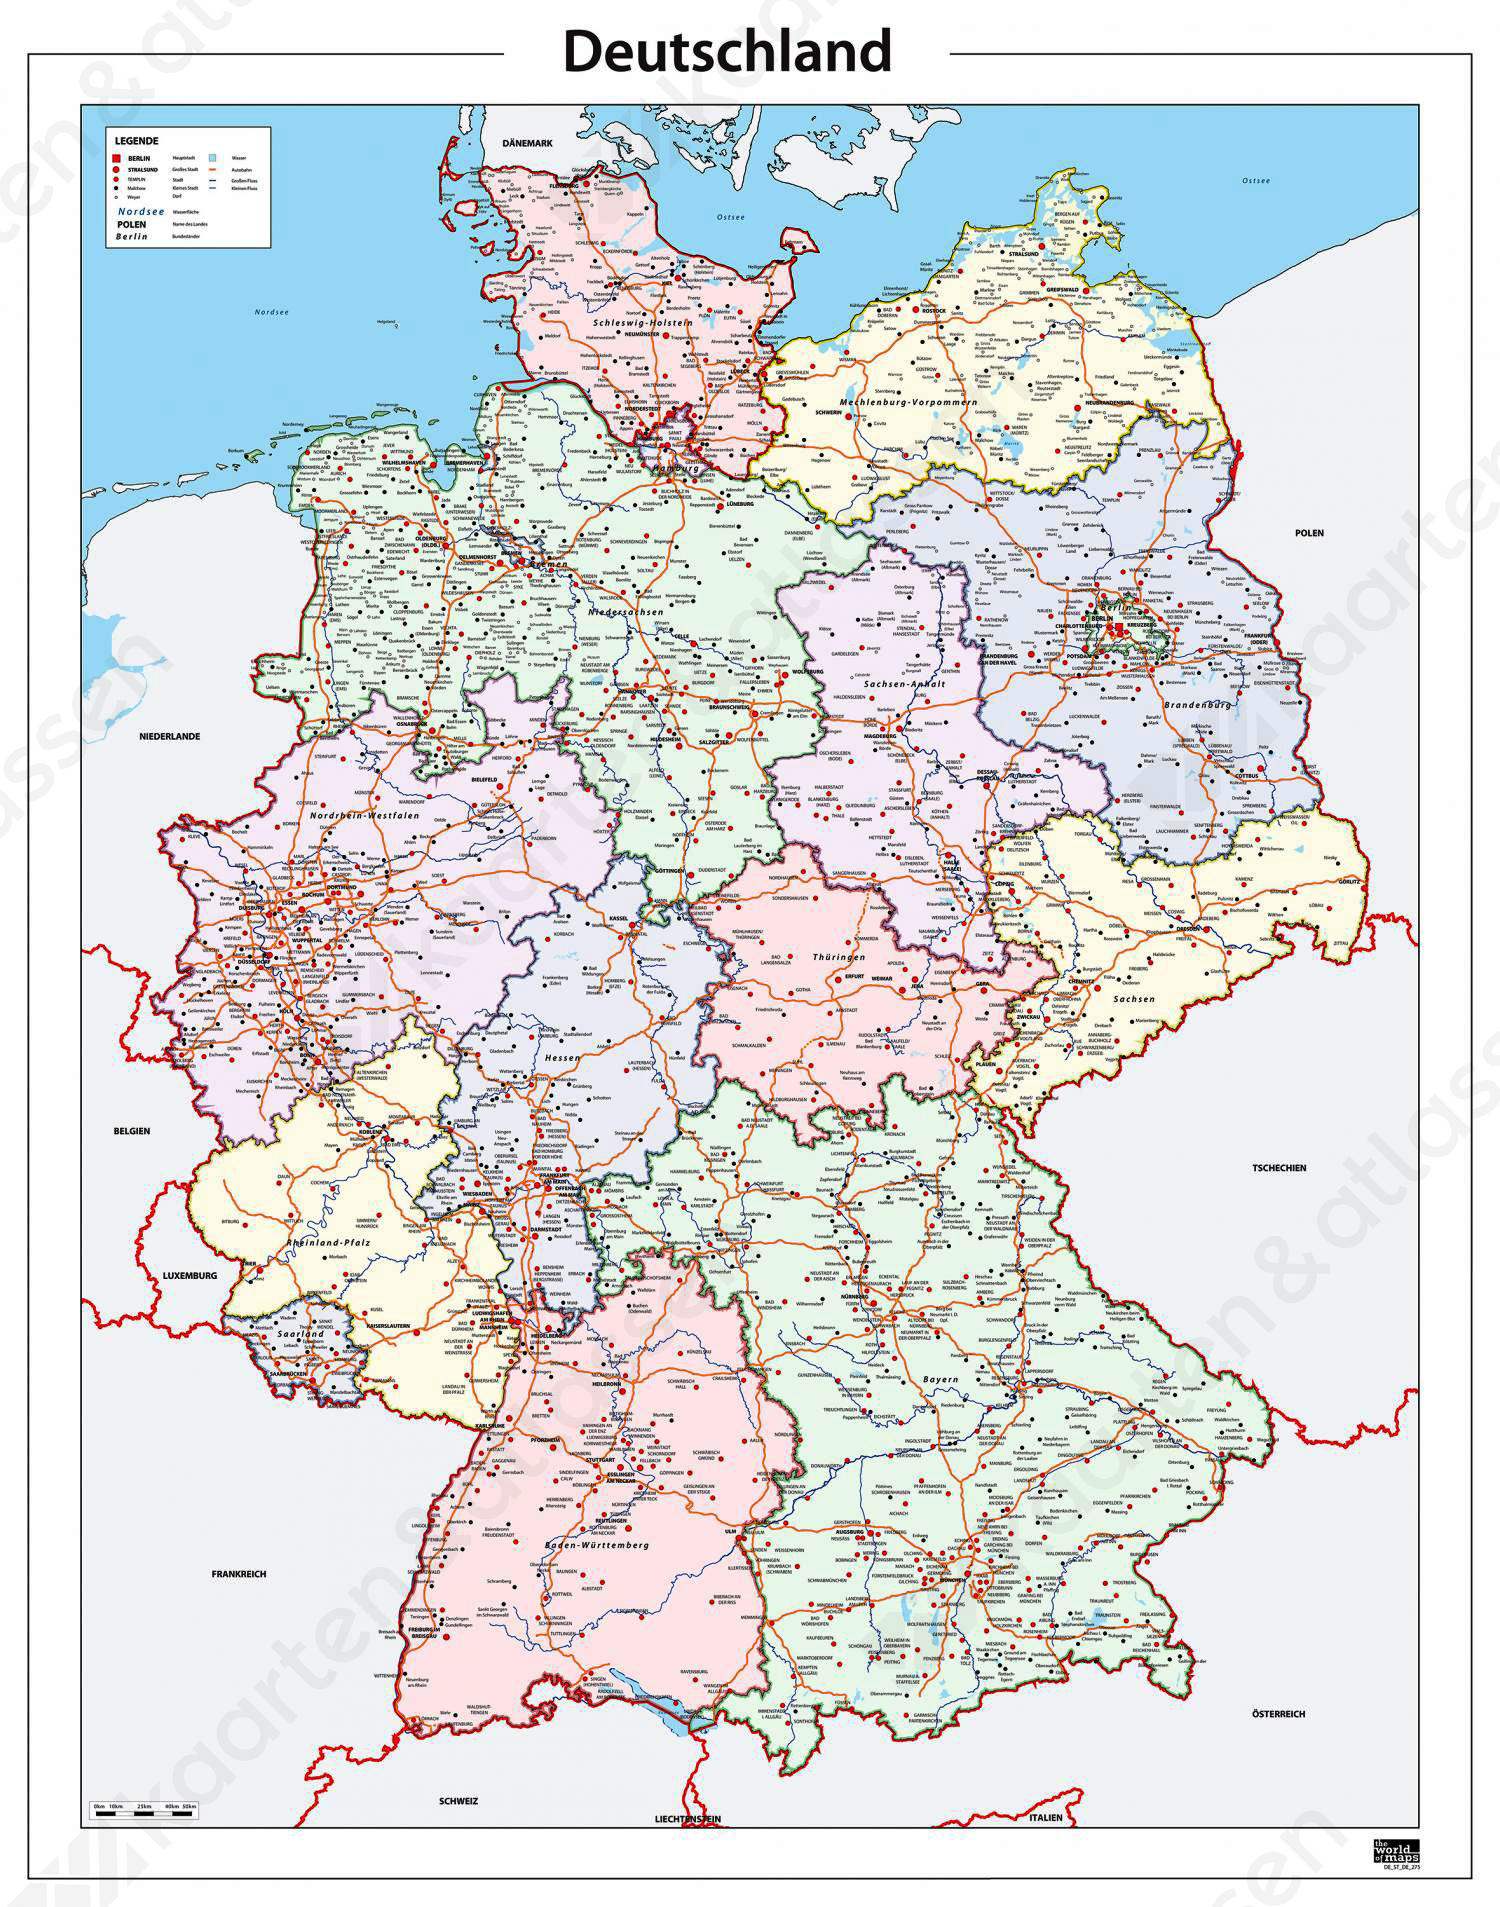 kaart duitsland Digitale Kaart Duitsland 275 | Kaarten en Atlassen.nl